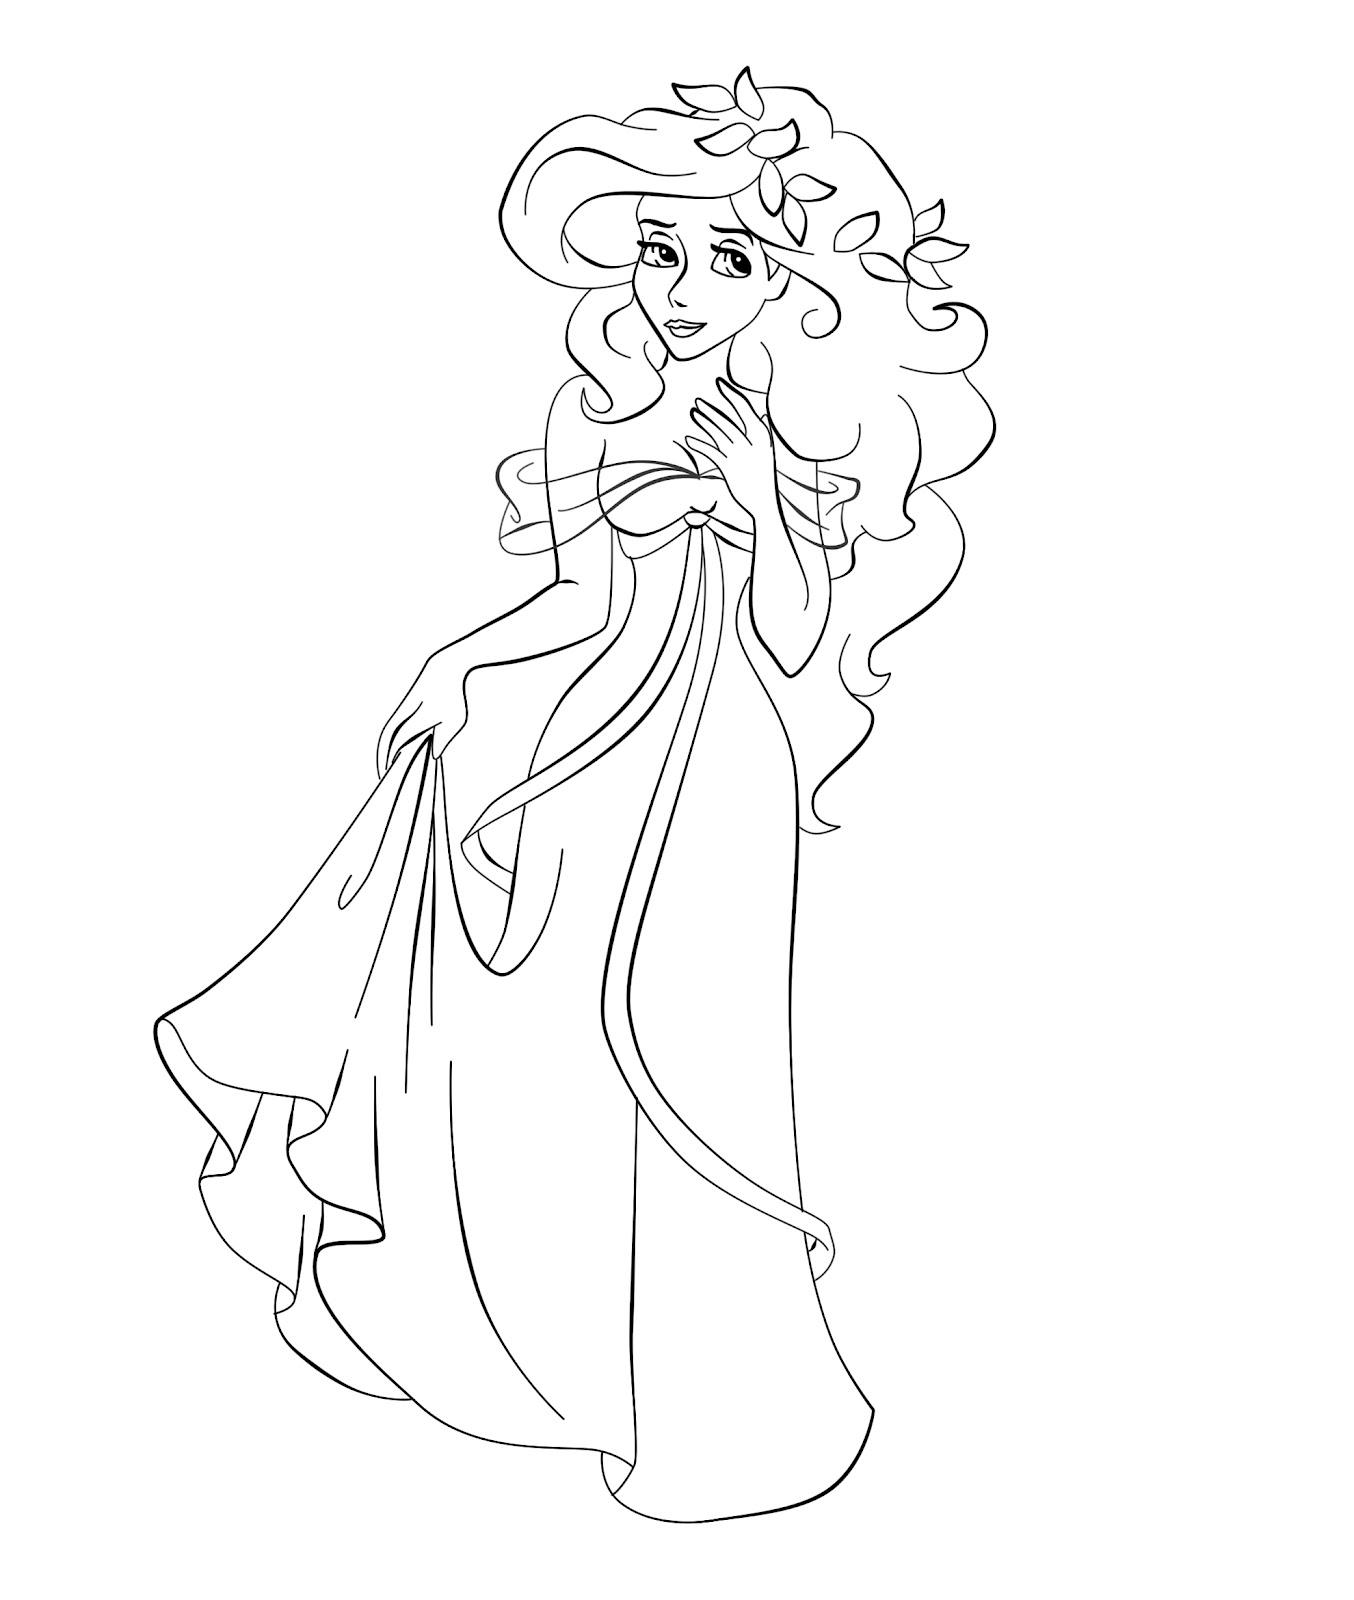 Disney Princess Coloring Pages Coloring Sheet Coloring